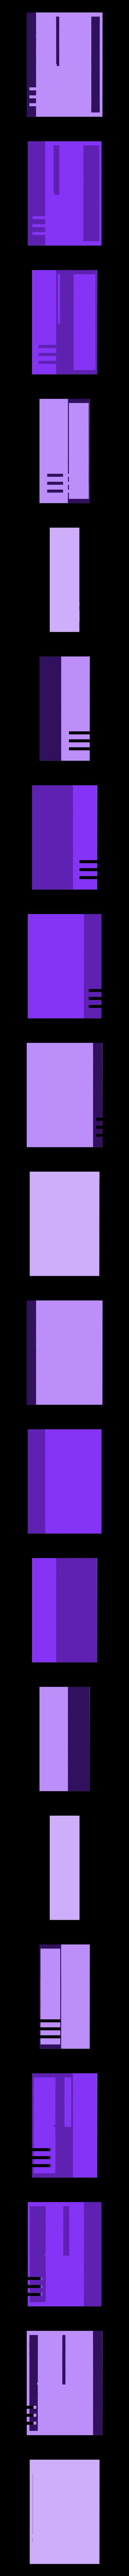 Sample.Box.stl Download free STL file Circuit Maze Project • 3D printer template, Urulysman